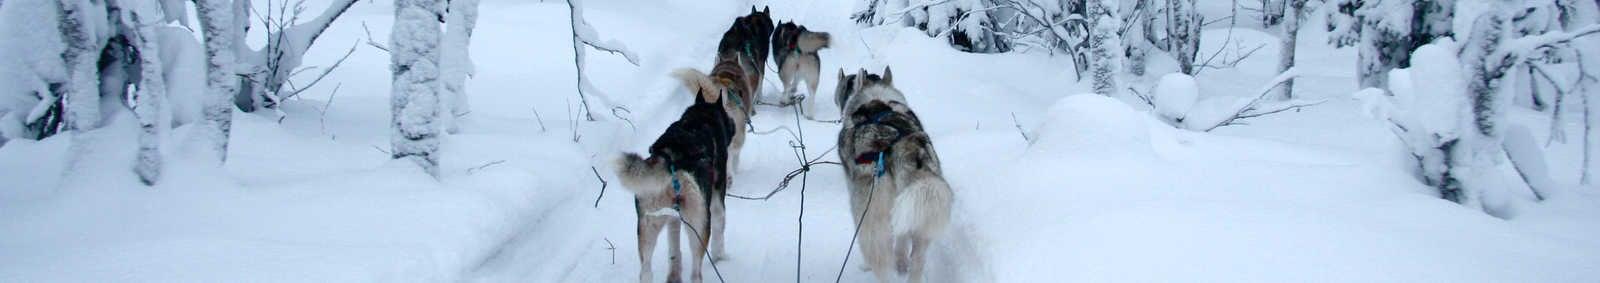 Dogsledding through Riisitunturi National Park, Finland